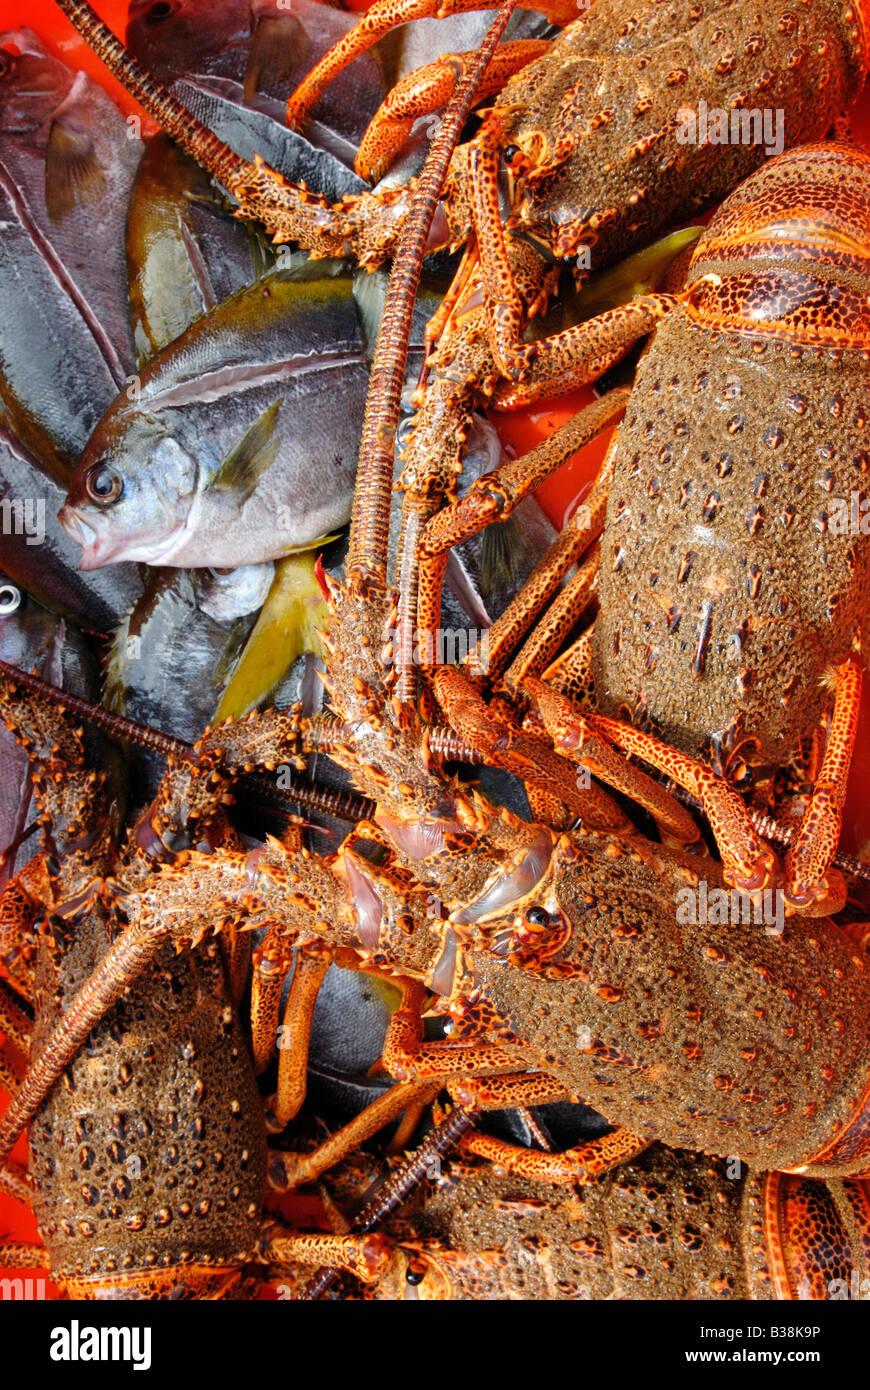 CHL Chile Juan Fernandez archipelago Robinson Crusoe Island 05 2007 Fish pampanitos and alive crayfish - Stock Image